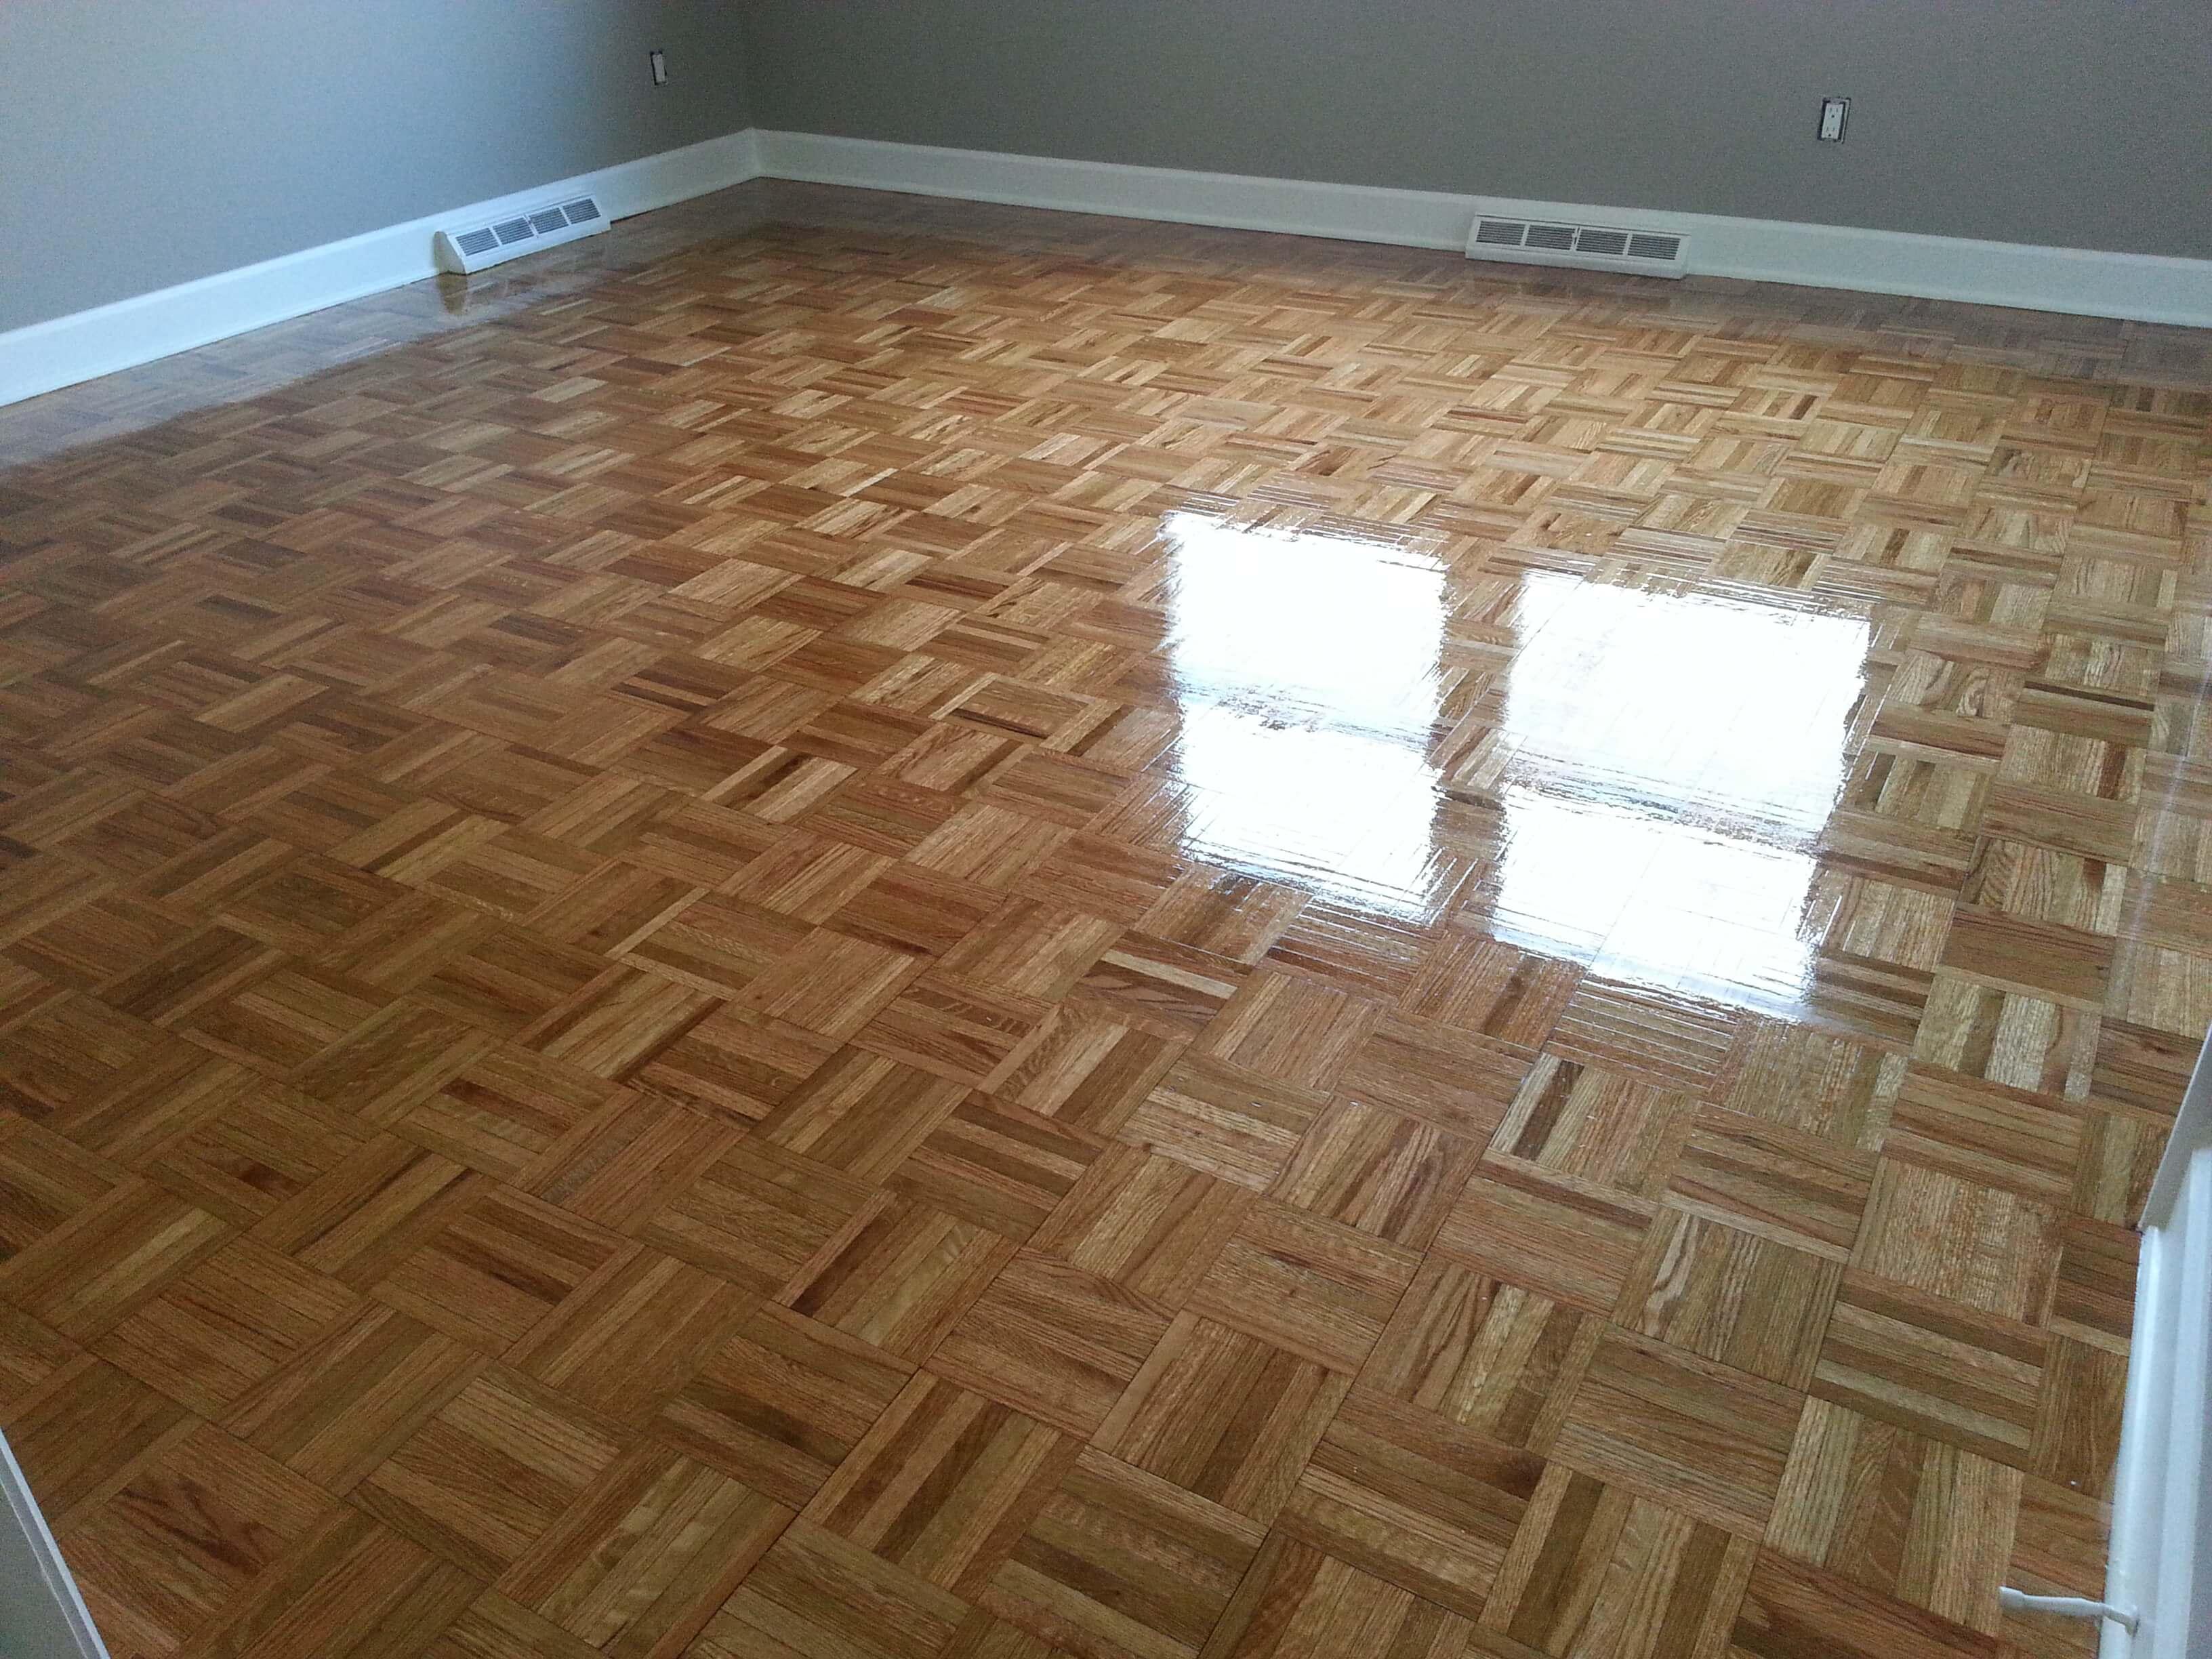 a refinished parquet hardwood floor in Trenton